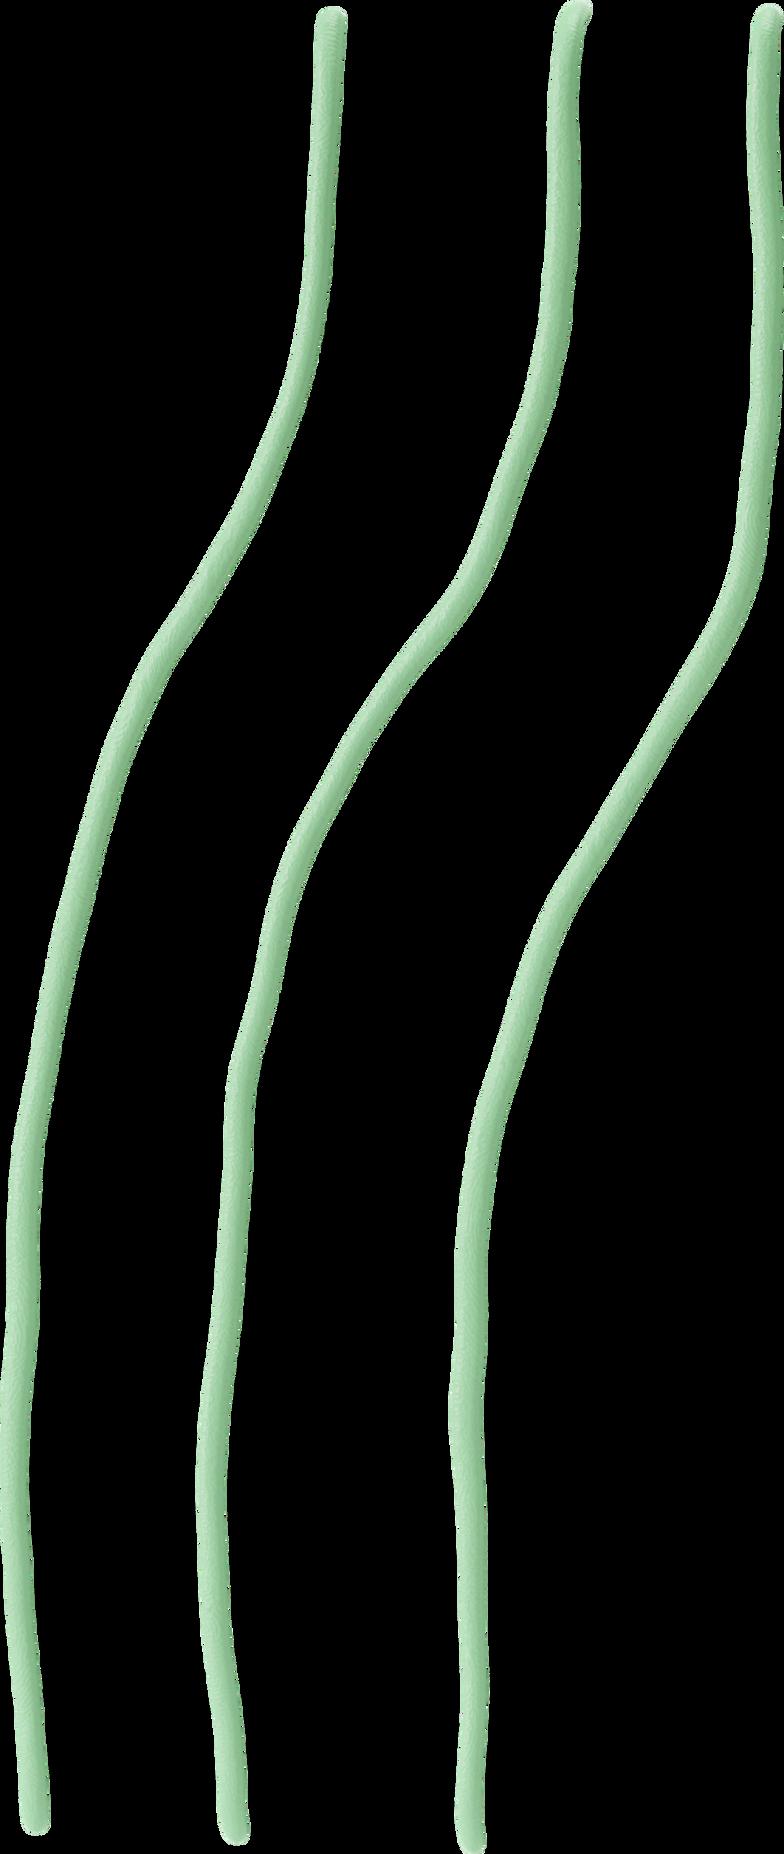 Strap man linie Clipart-Grafik als PNG, SVG